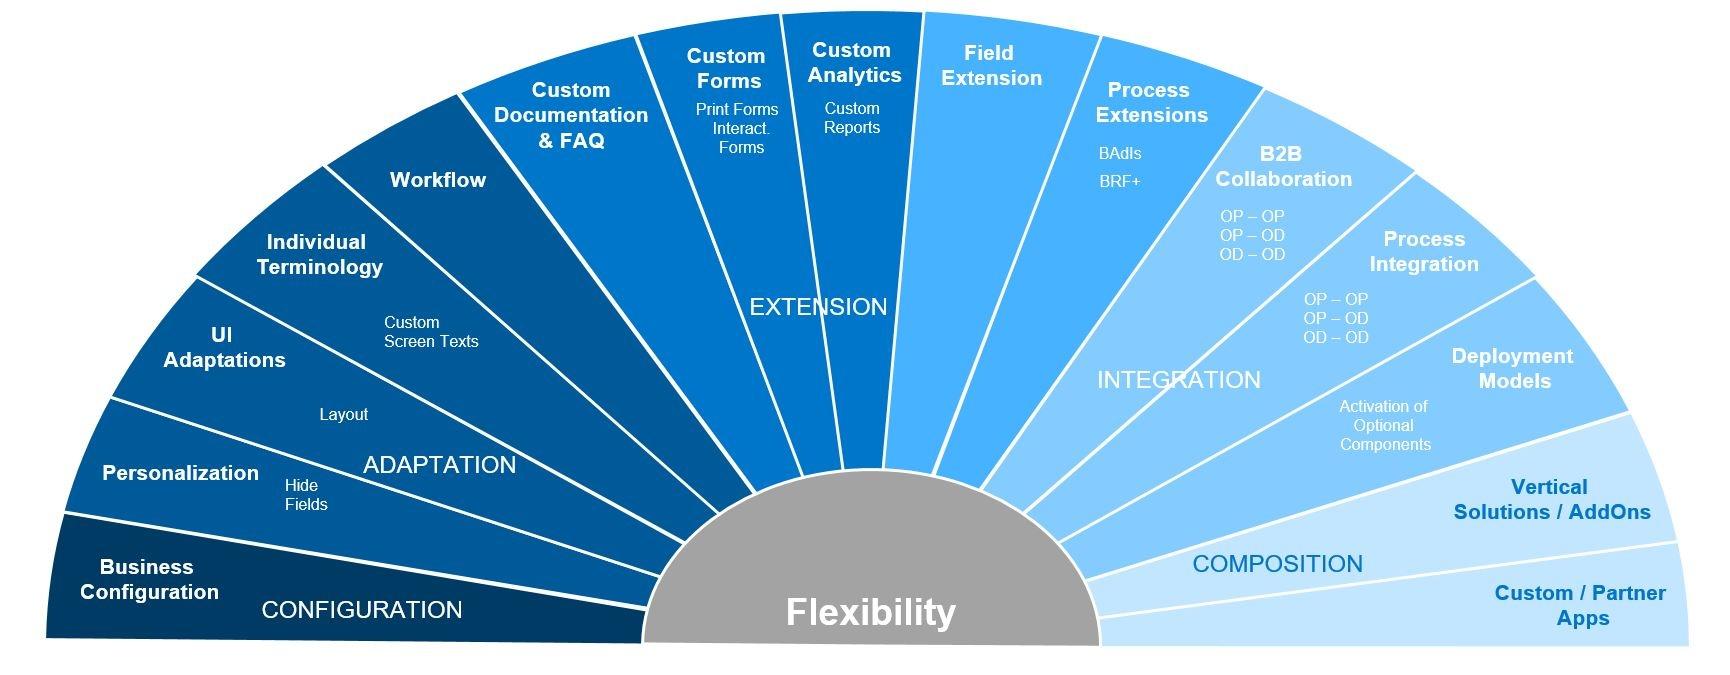 Sap Fiori For S4hana Scn Wiki Fileinstalling Electrical Wiringjpg Wikipedia The Free Jpeg File Extensibility Fan